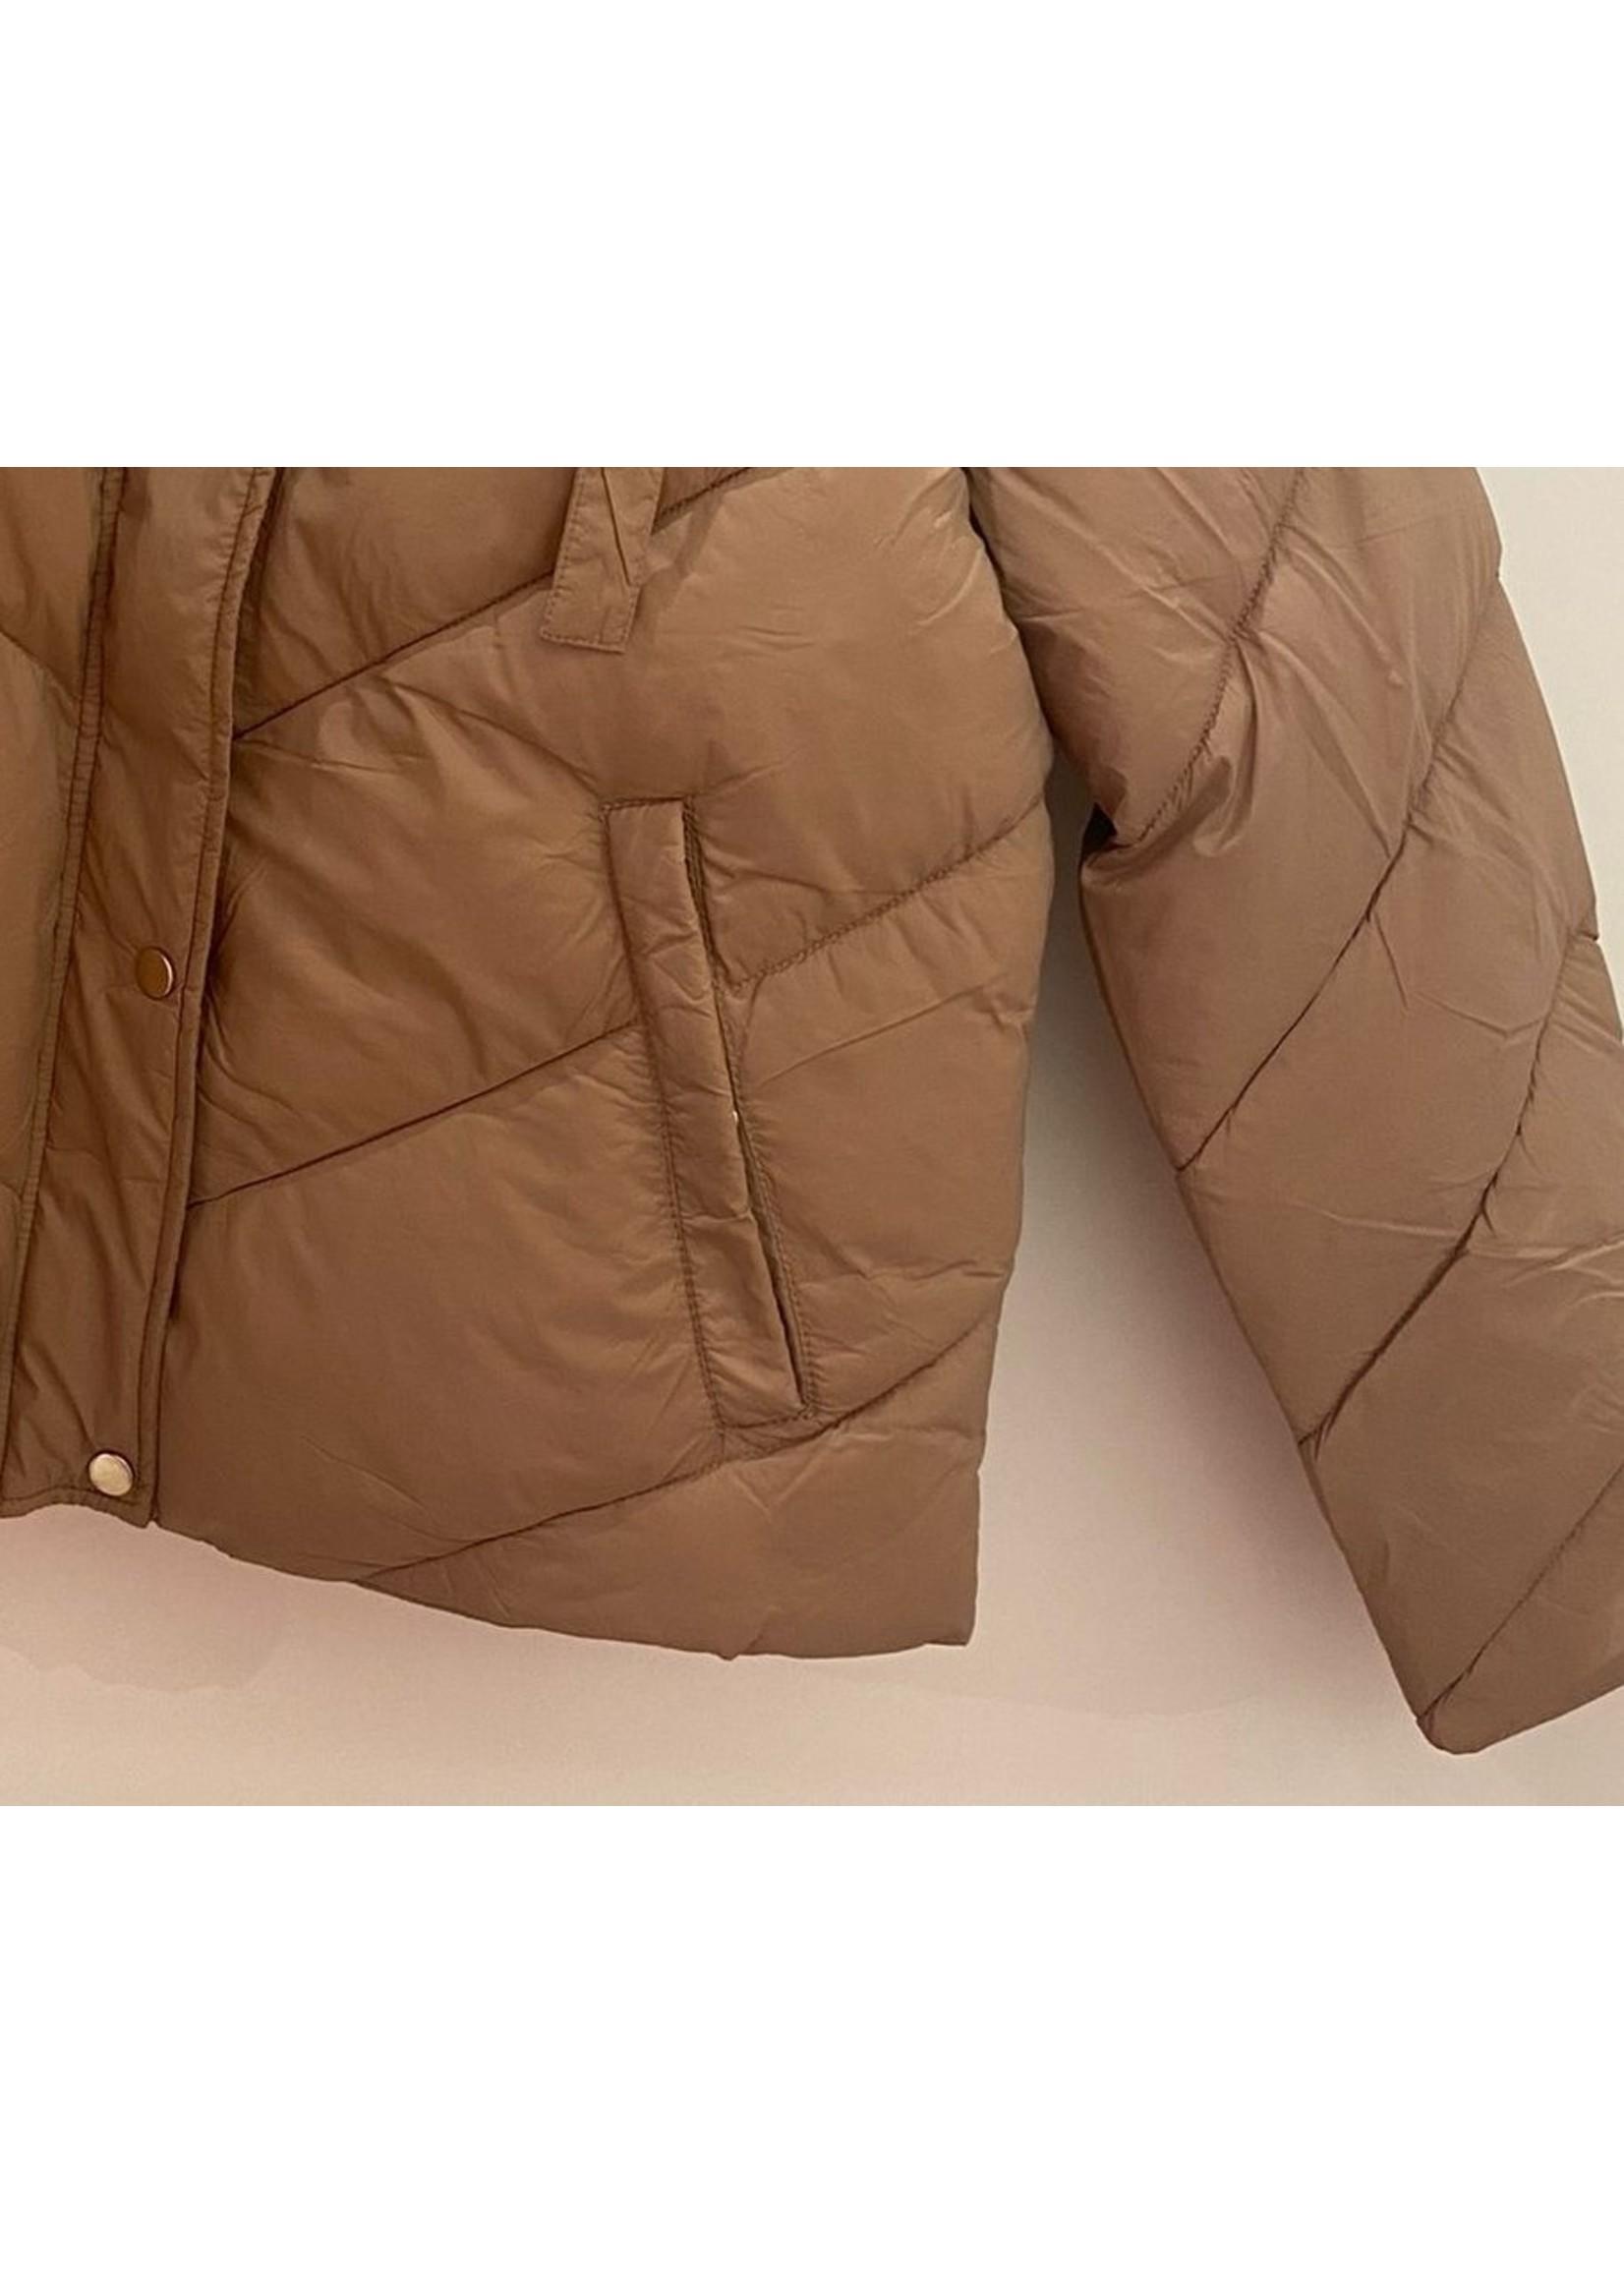 Saint Tropez HayliSZ Short Jacket Light taupe